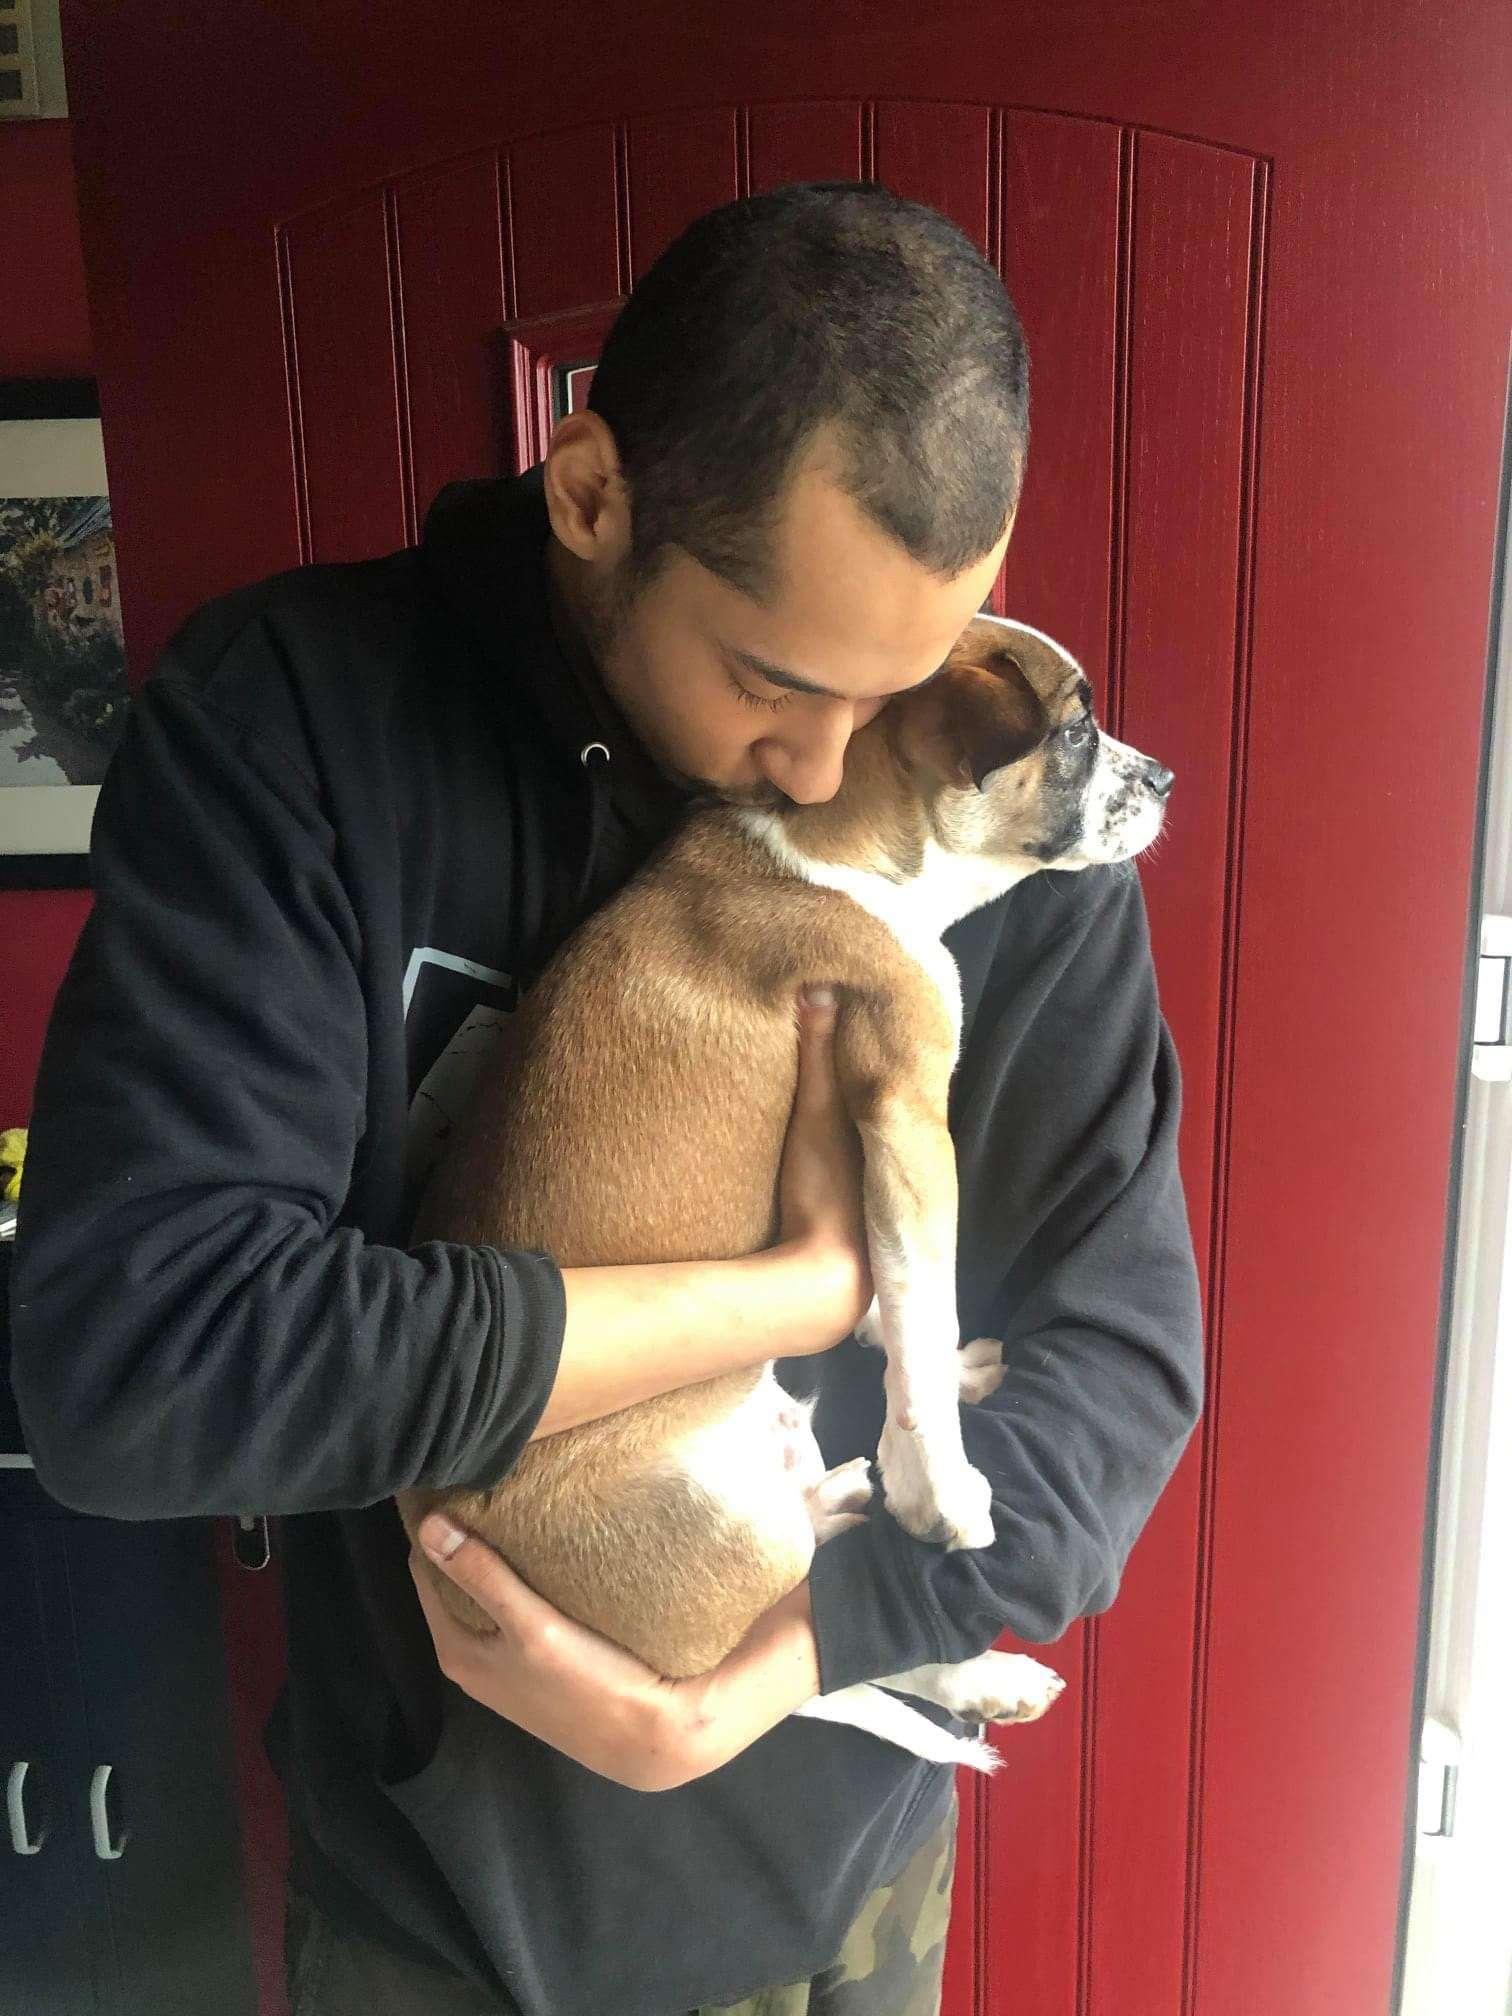 Stolen MOXLEY reunited #PetTheftReform